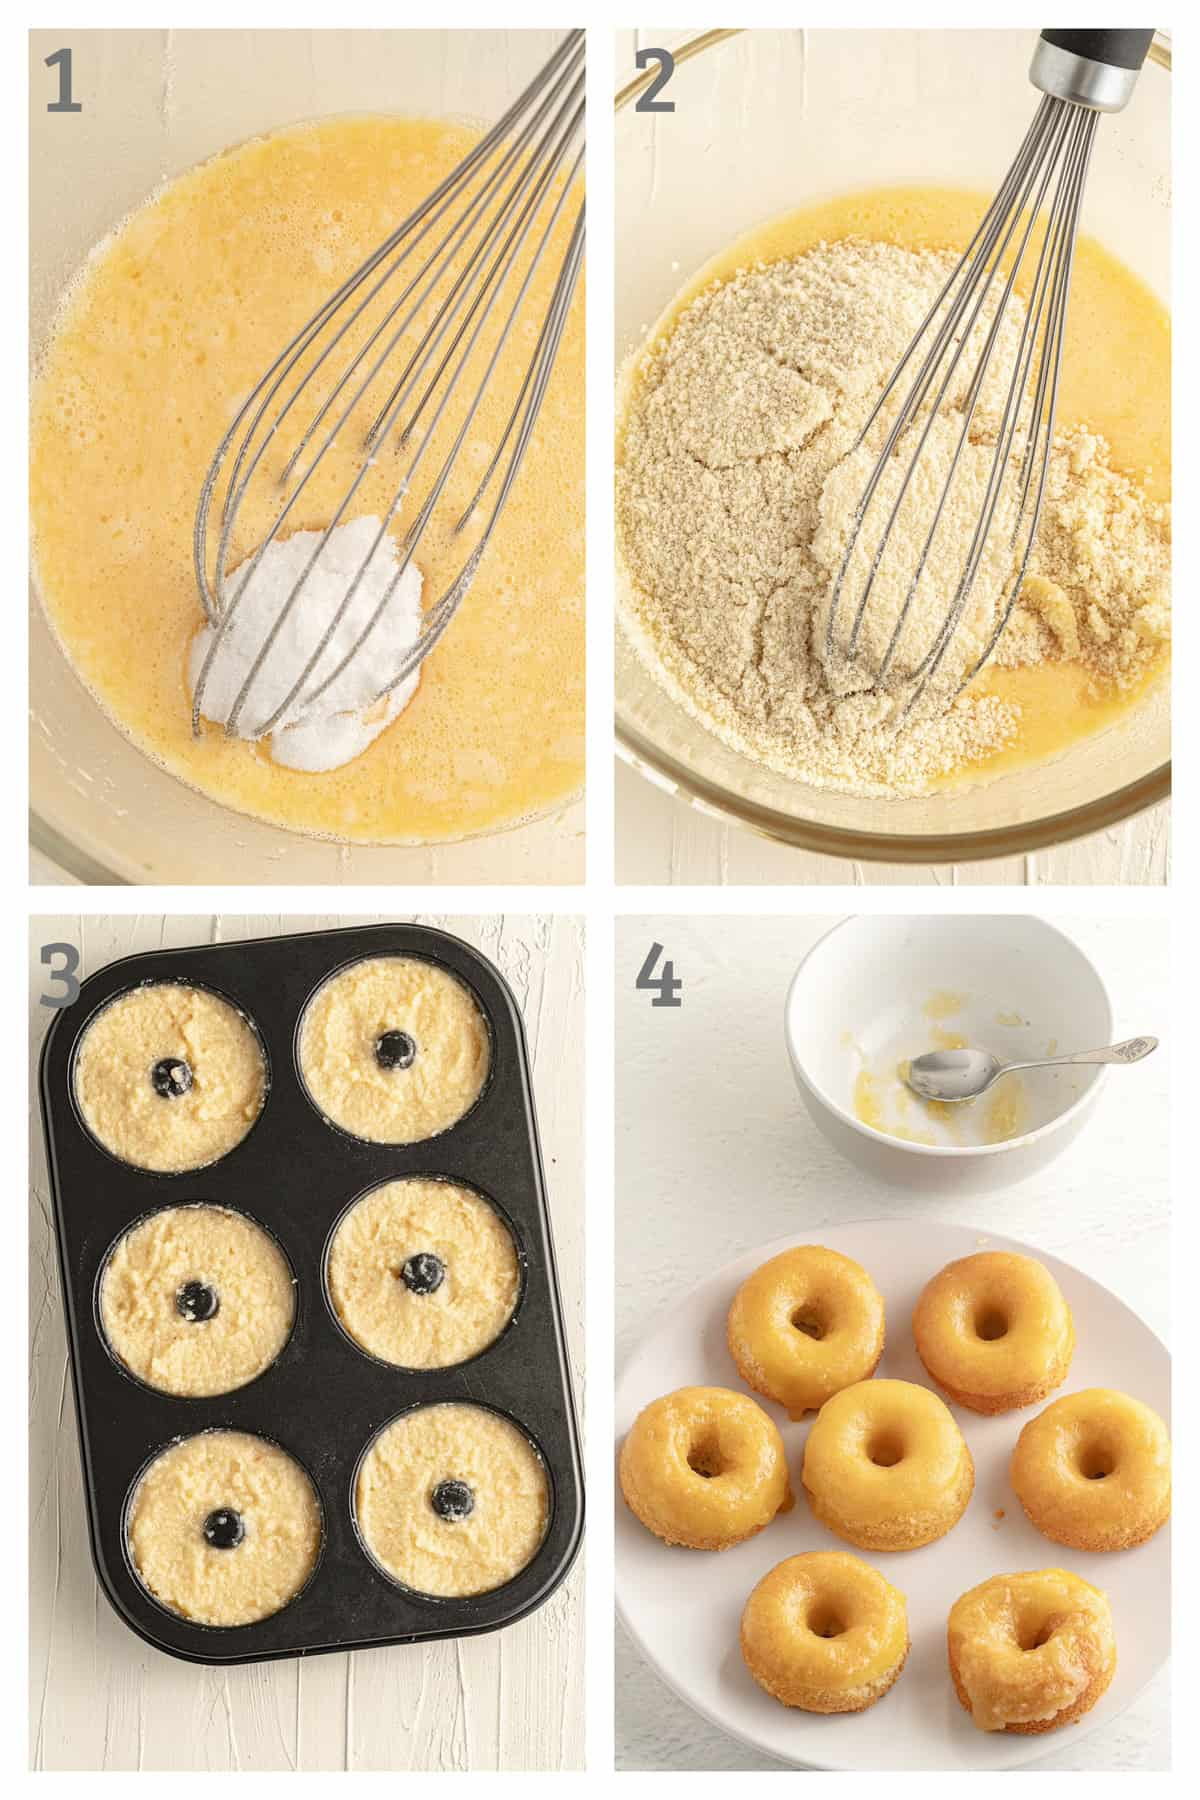 Step by Step Instructions to make Keto Lemon Glazed Donuts Step by Step Instructions